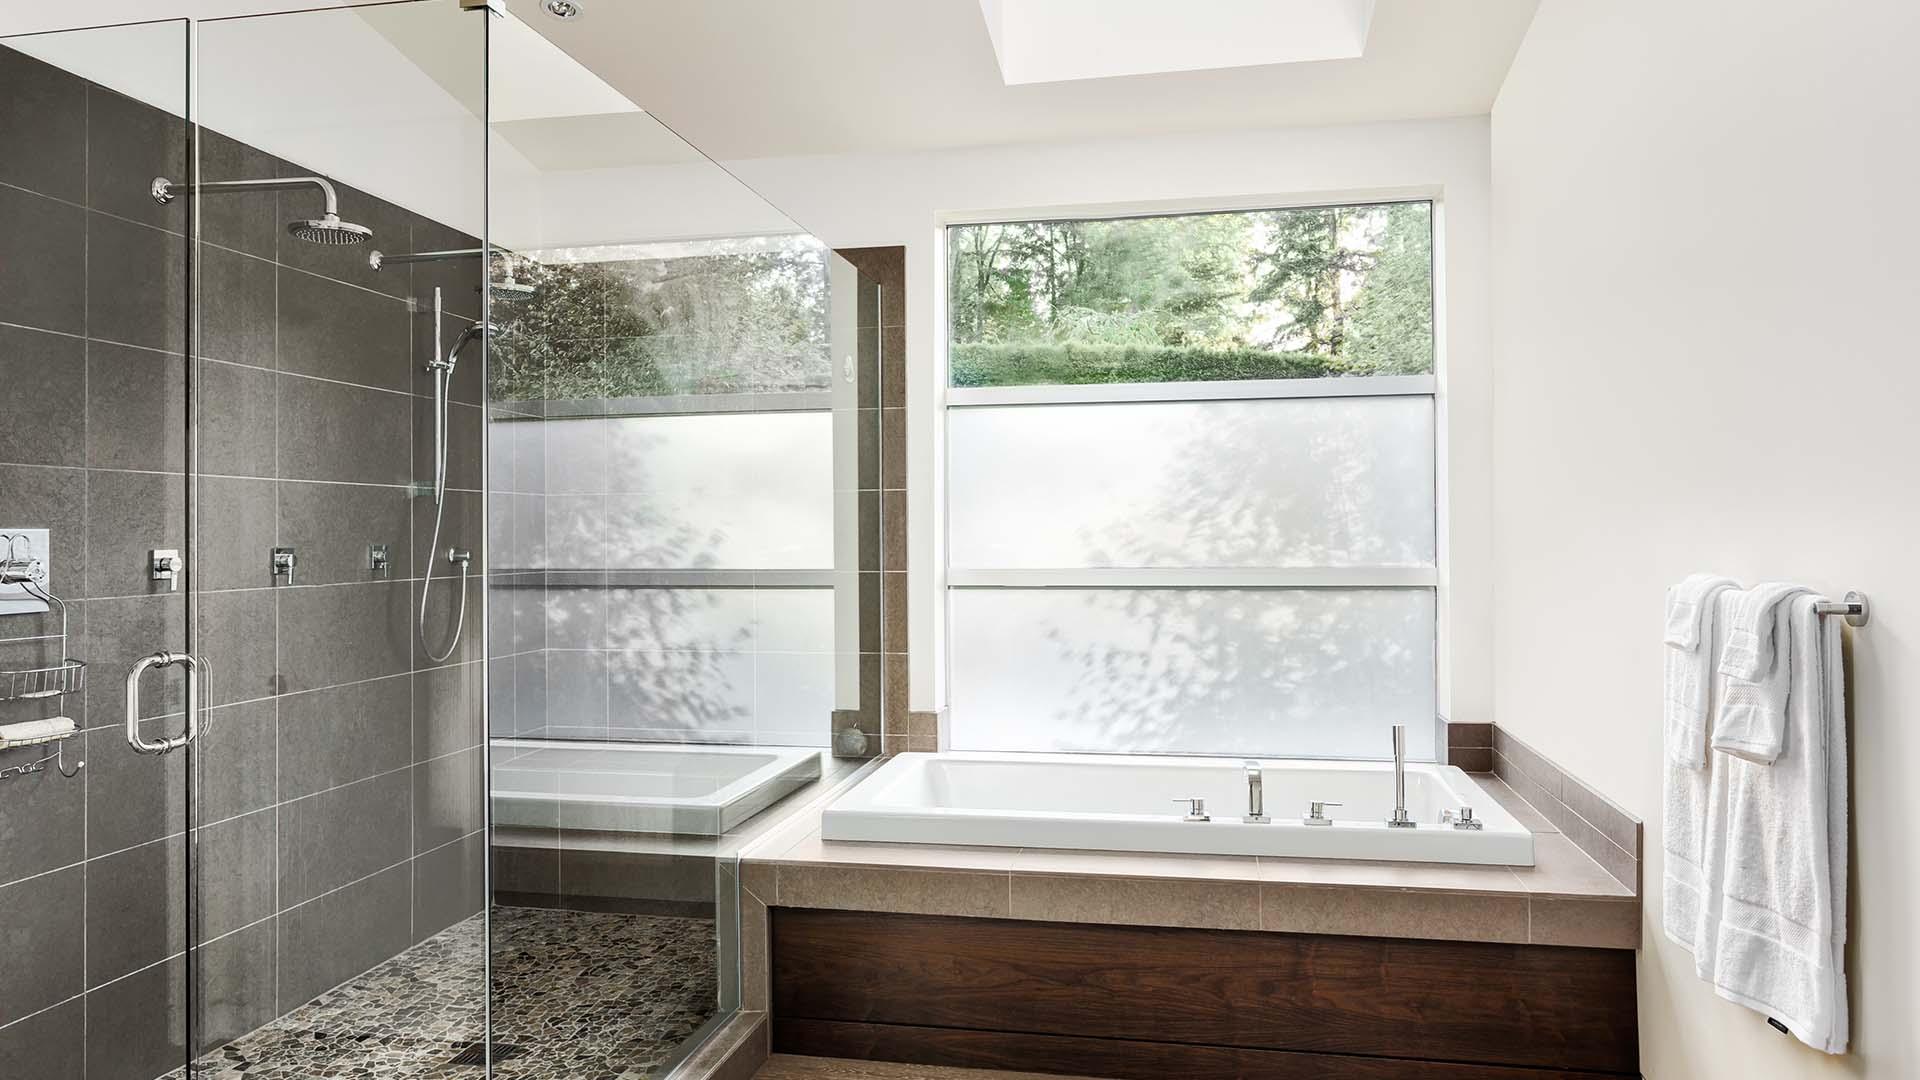 Limitless Renovations | Bathroom, Shower Remodel & Renovations